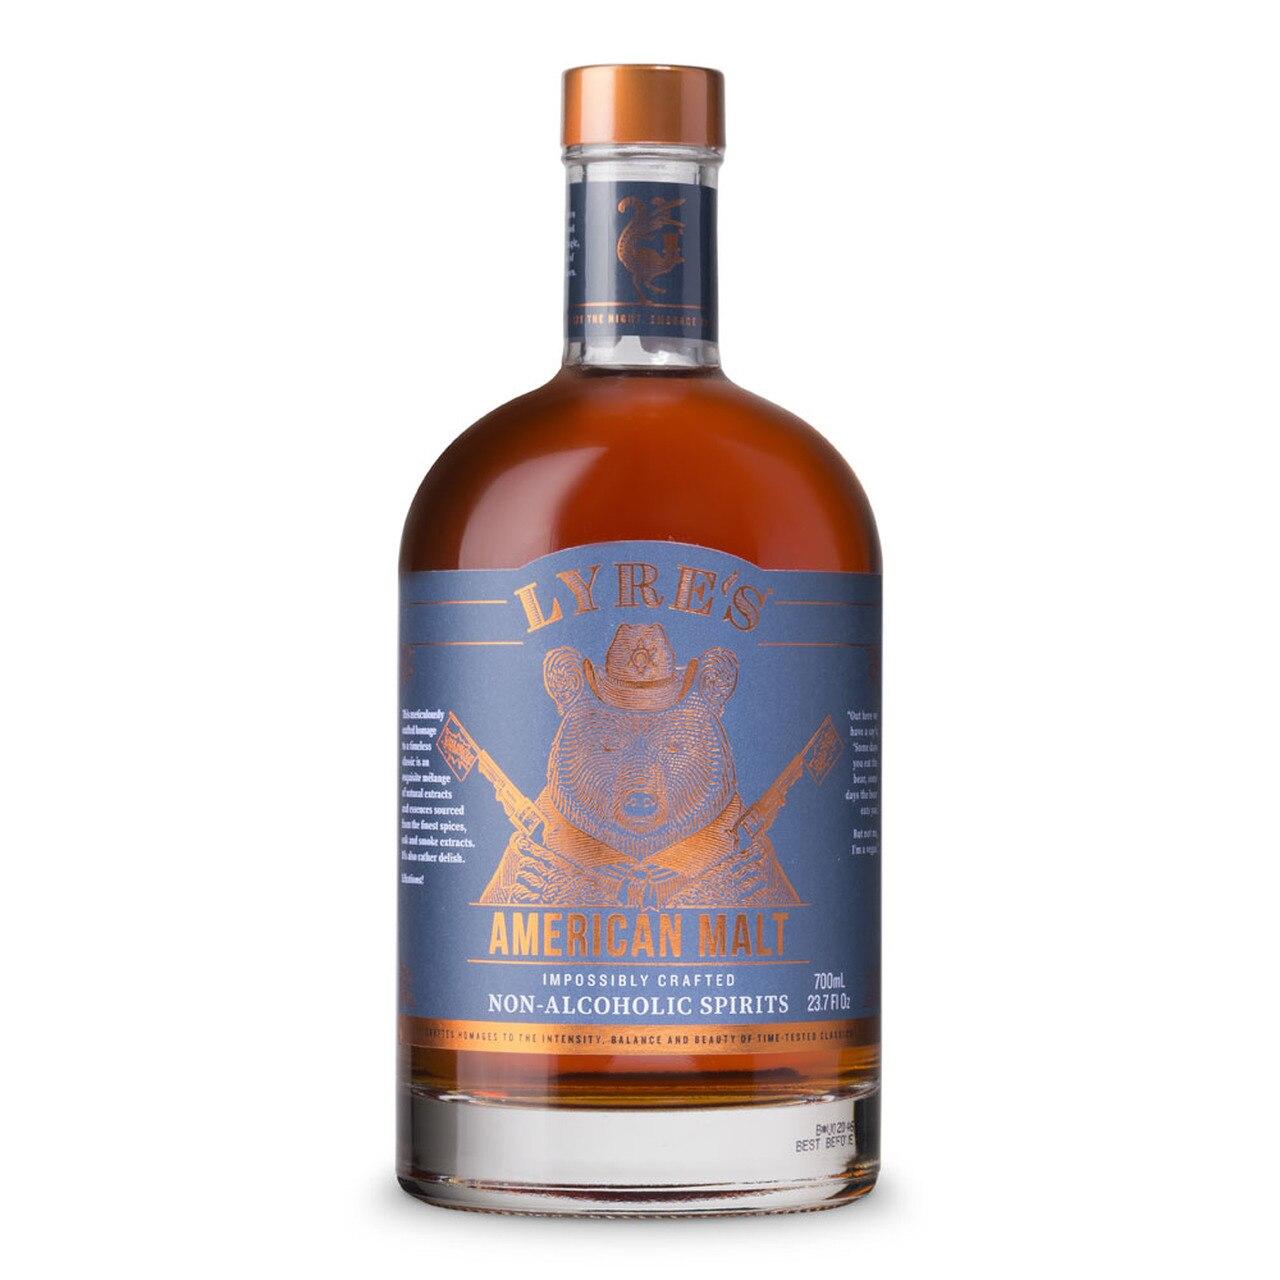 American Malt Non-Alcoholic Spirit